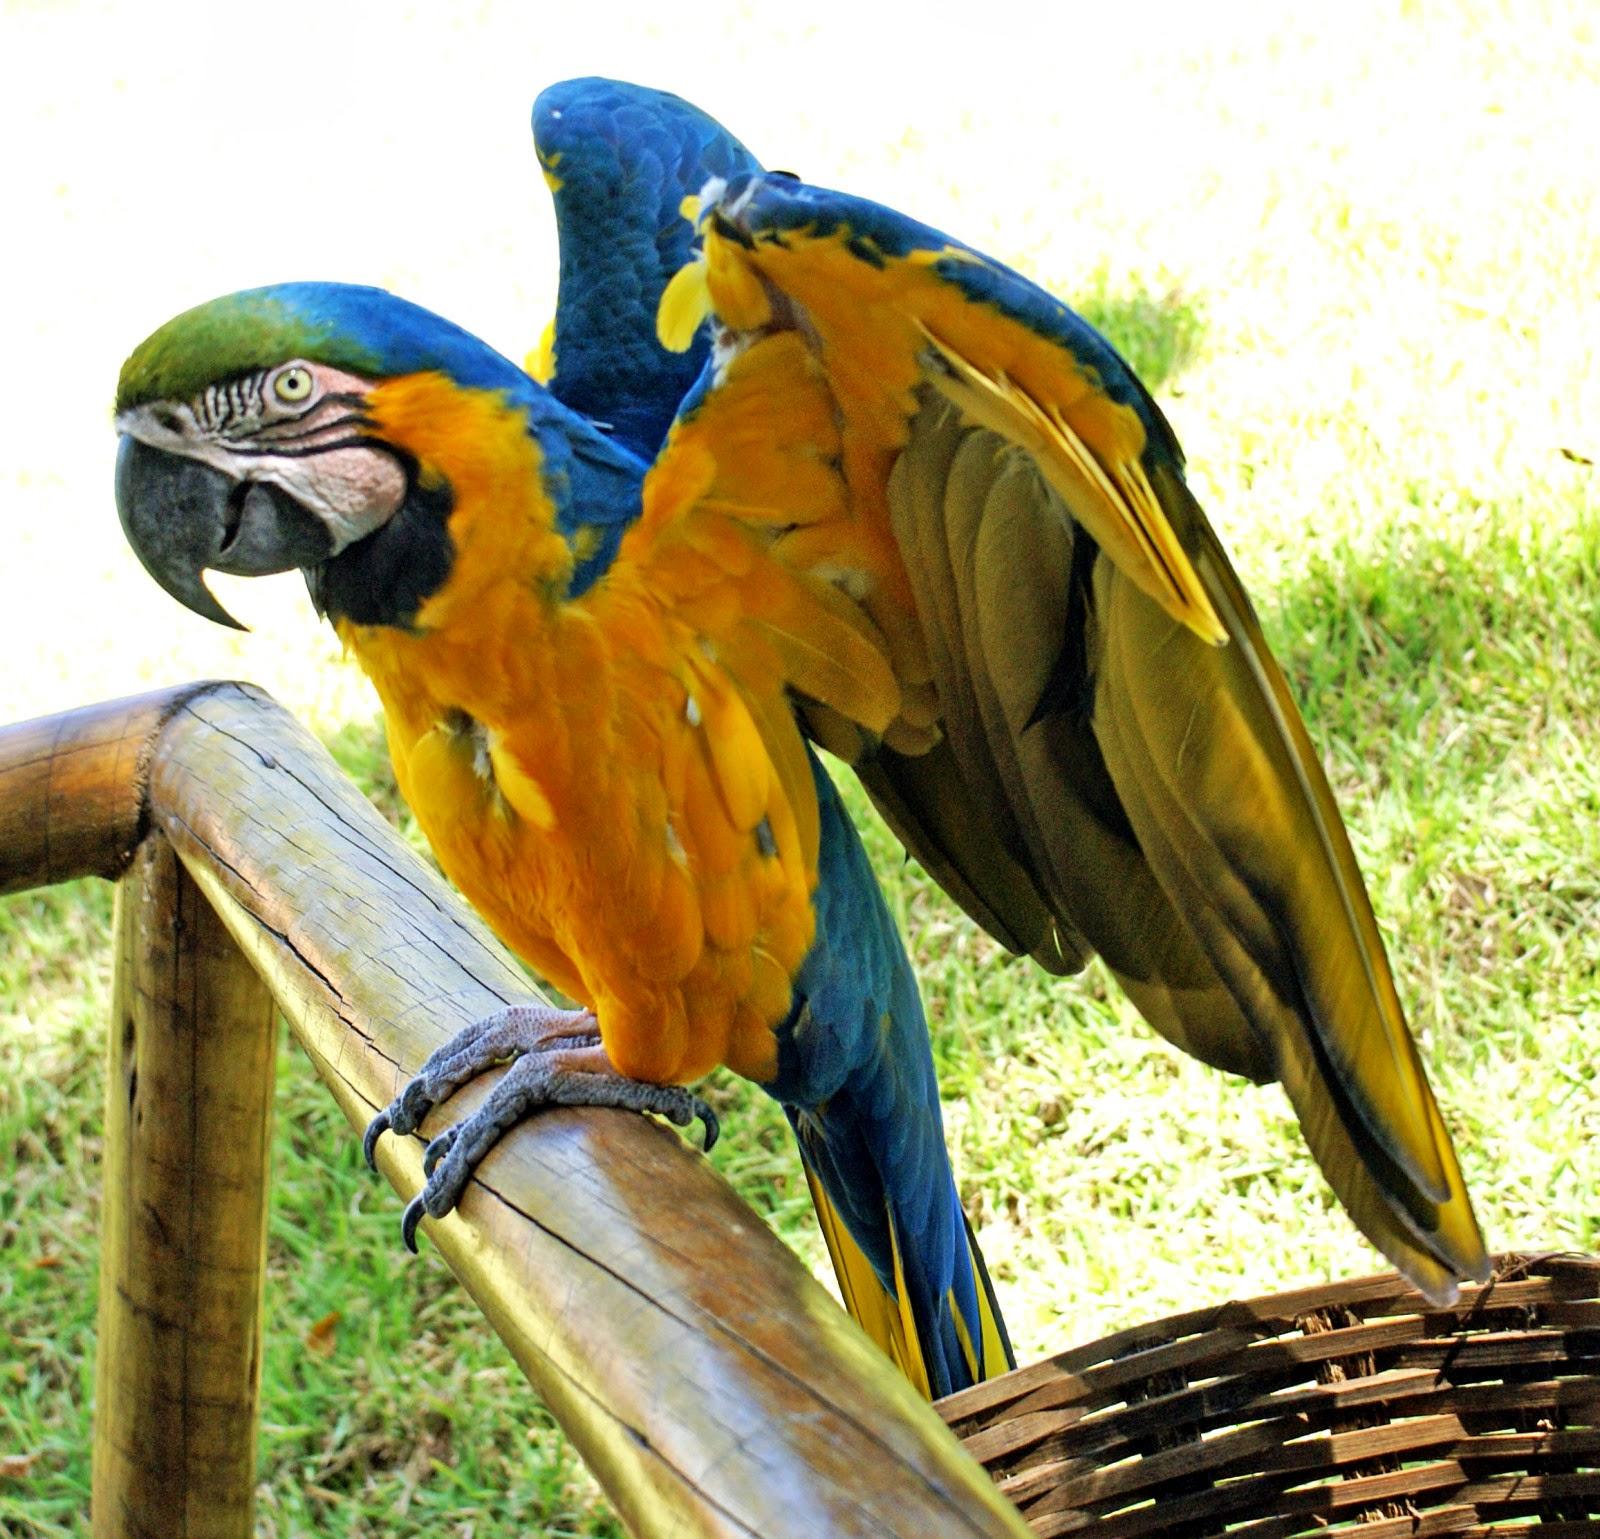 Gambar Burung Beo  Dunia Binatang